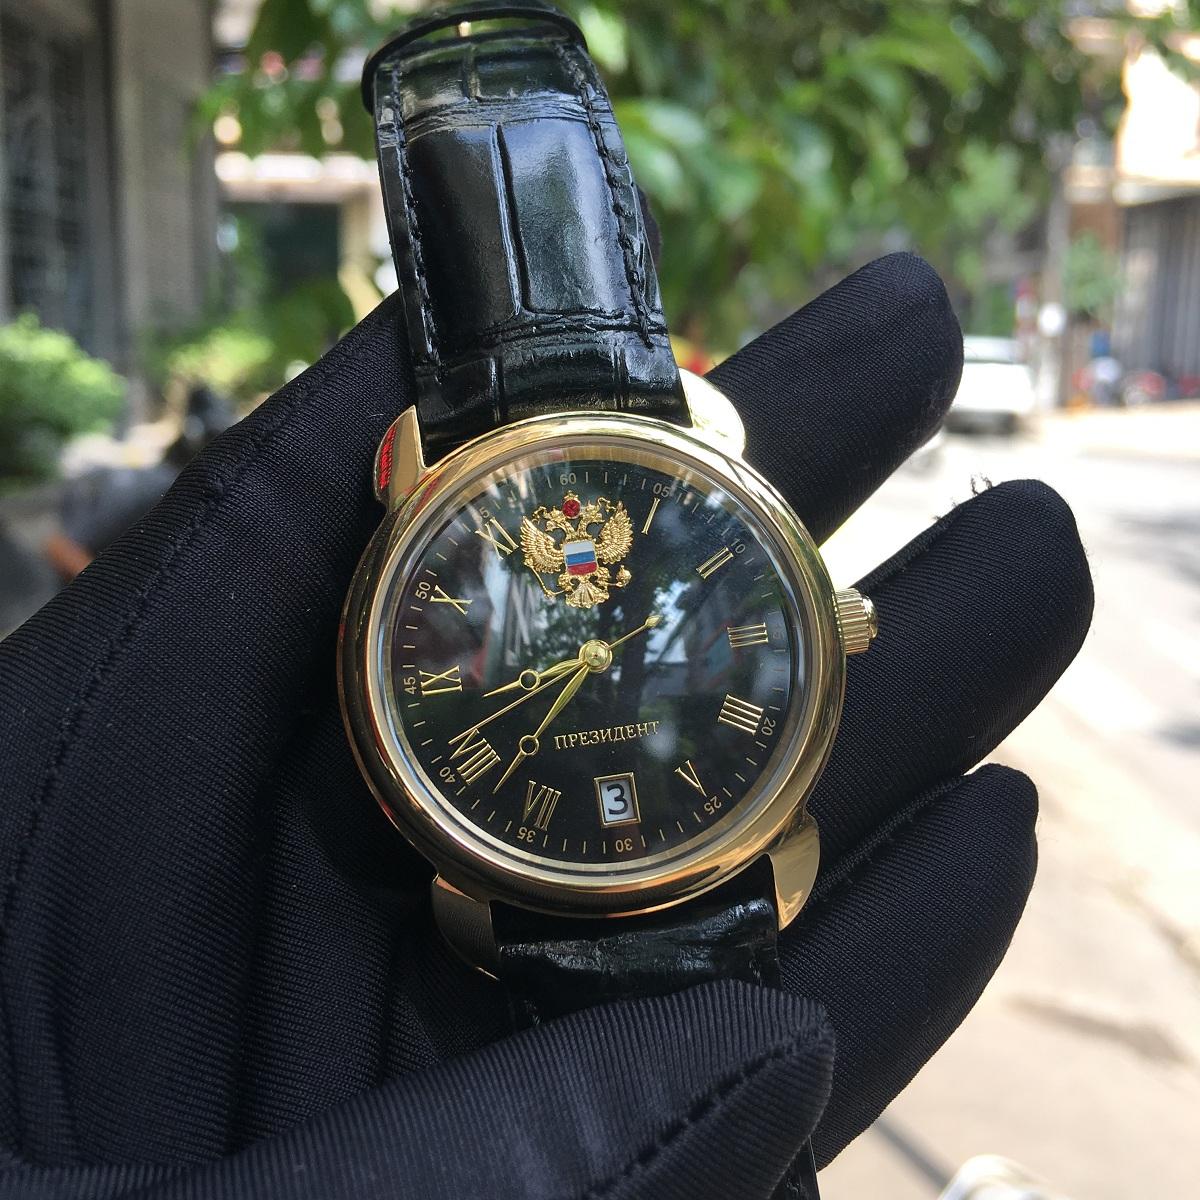 Đồng hồ Poljot President Gold Black luôn tỏa sáng và thu hút Dong-ho-poljot-president-gold-black